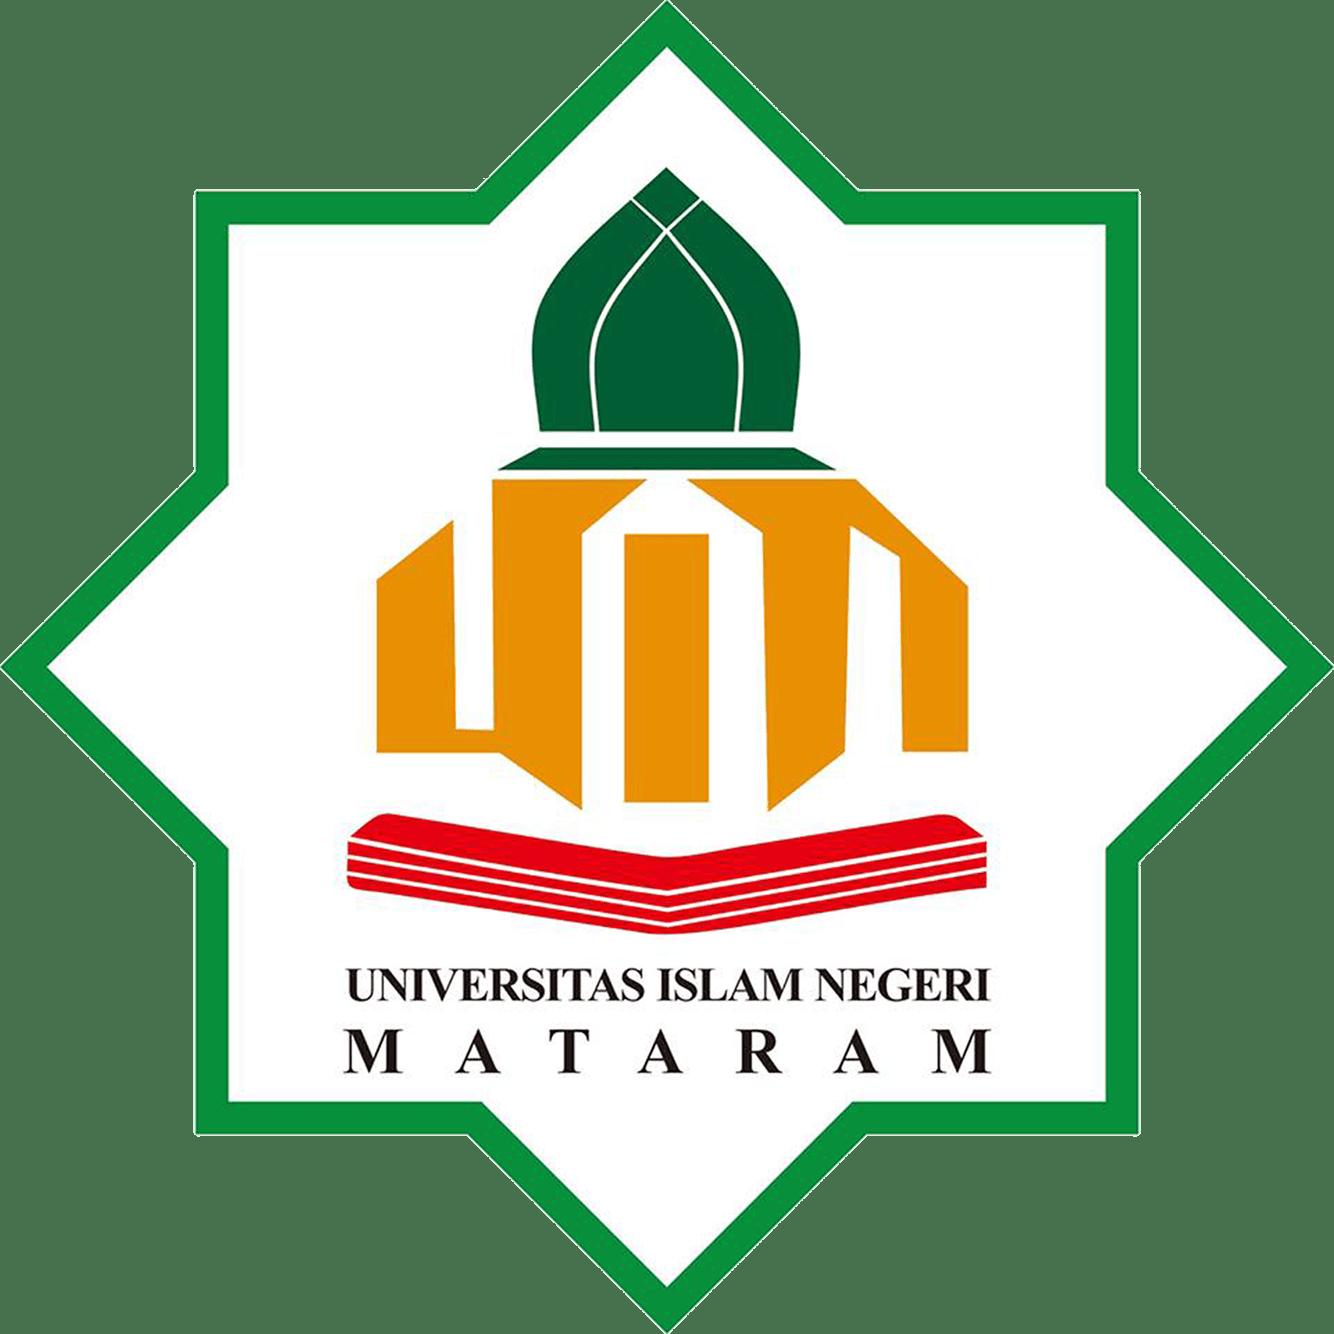 Logo uin malang png 8 » logodesignfx.